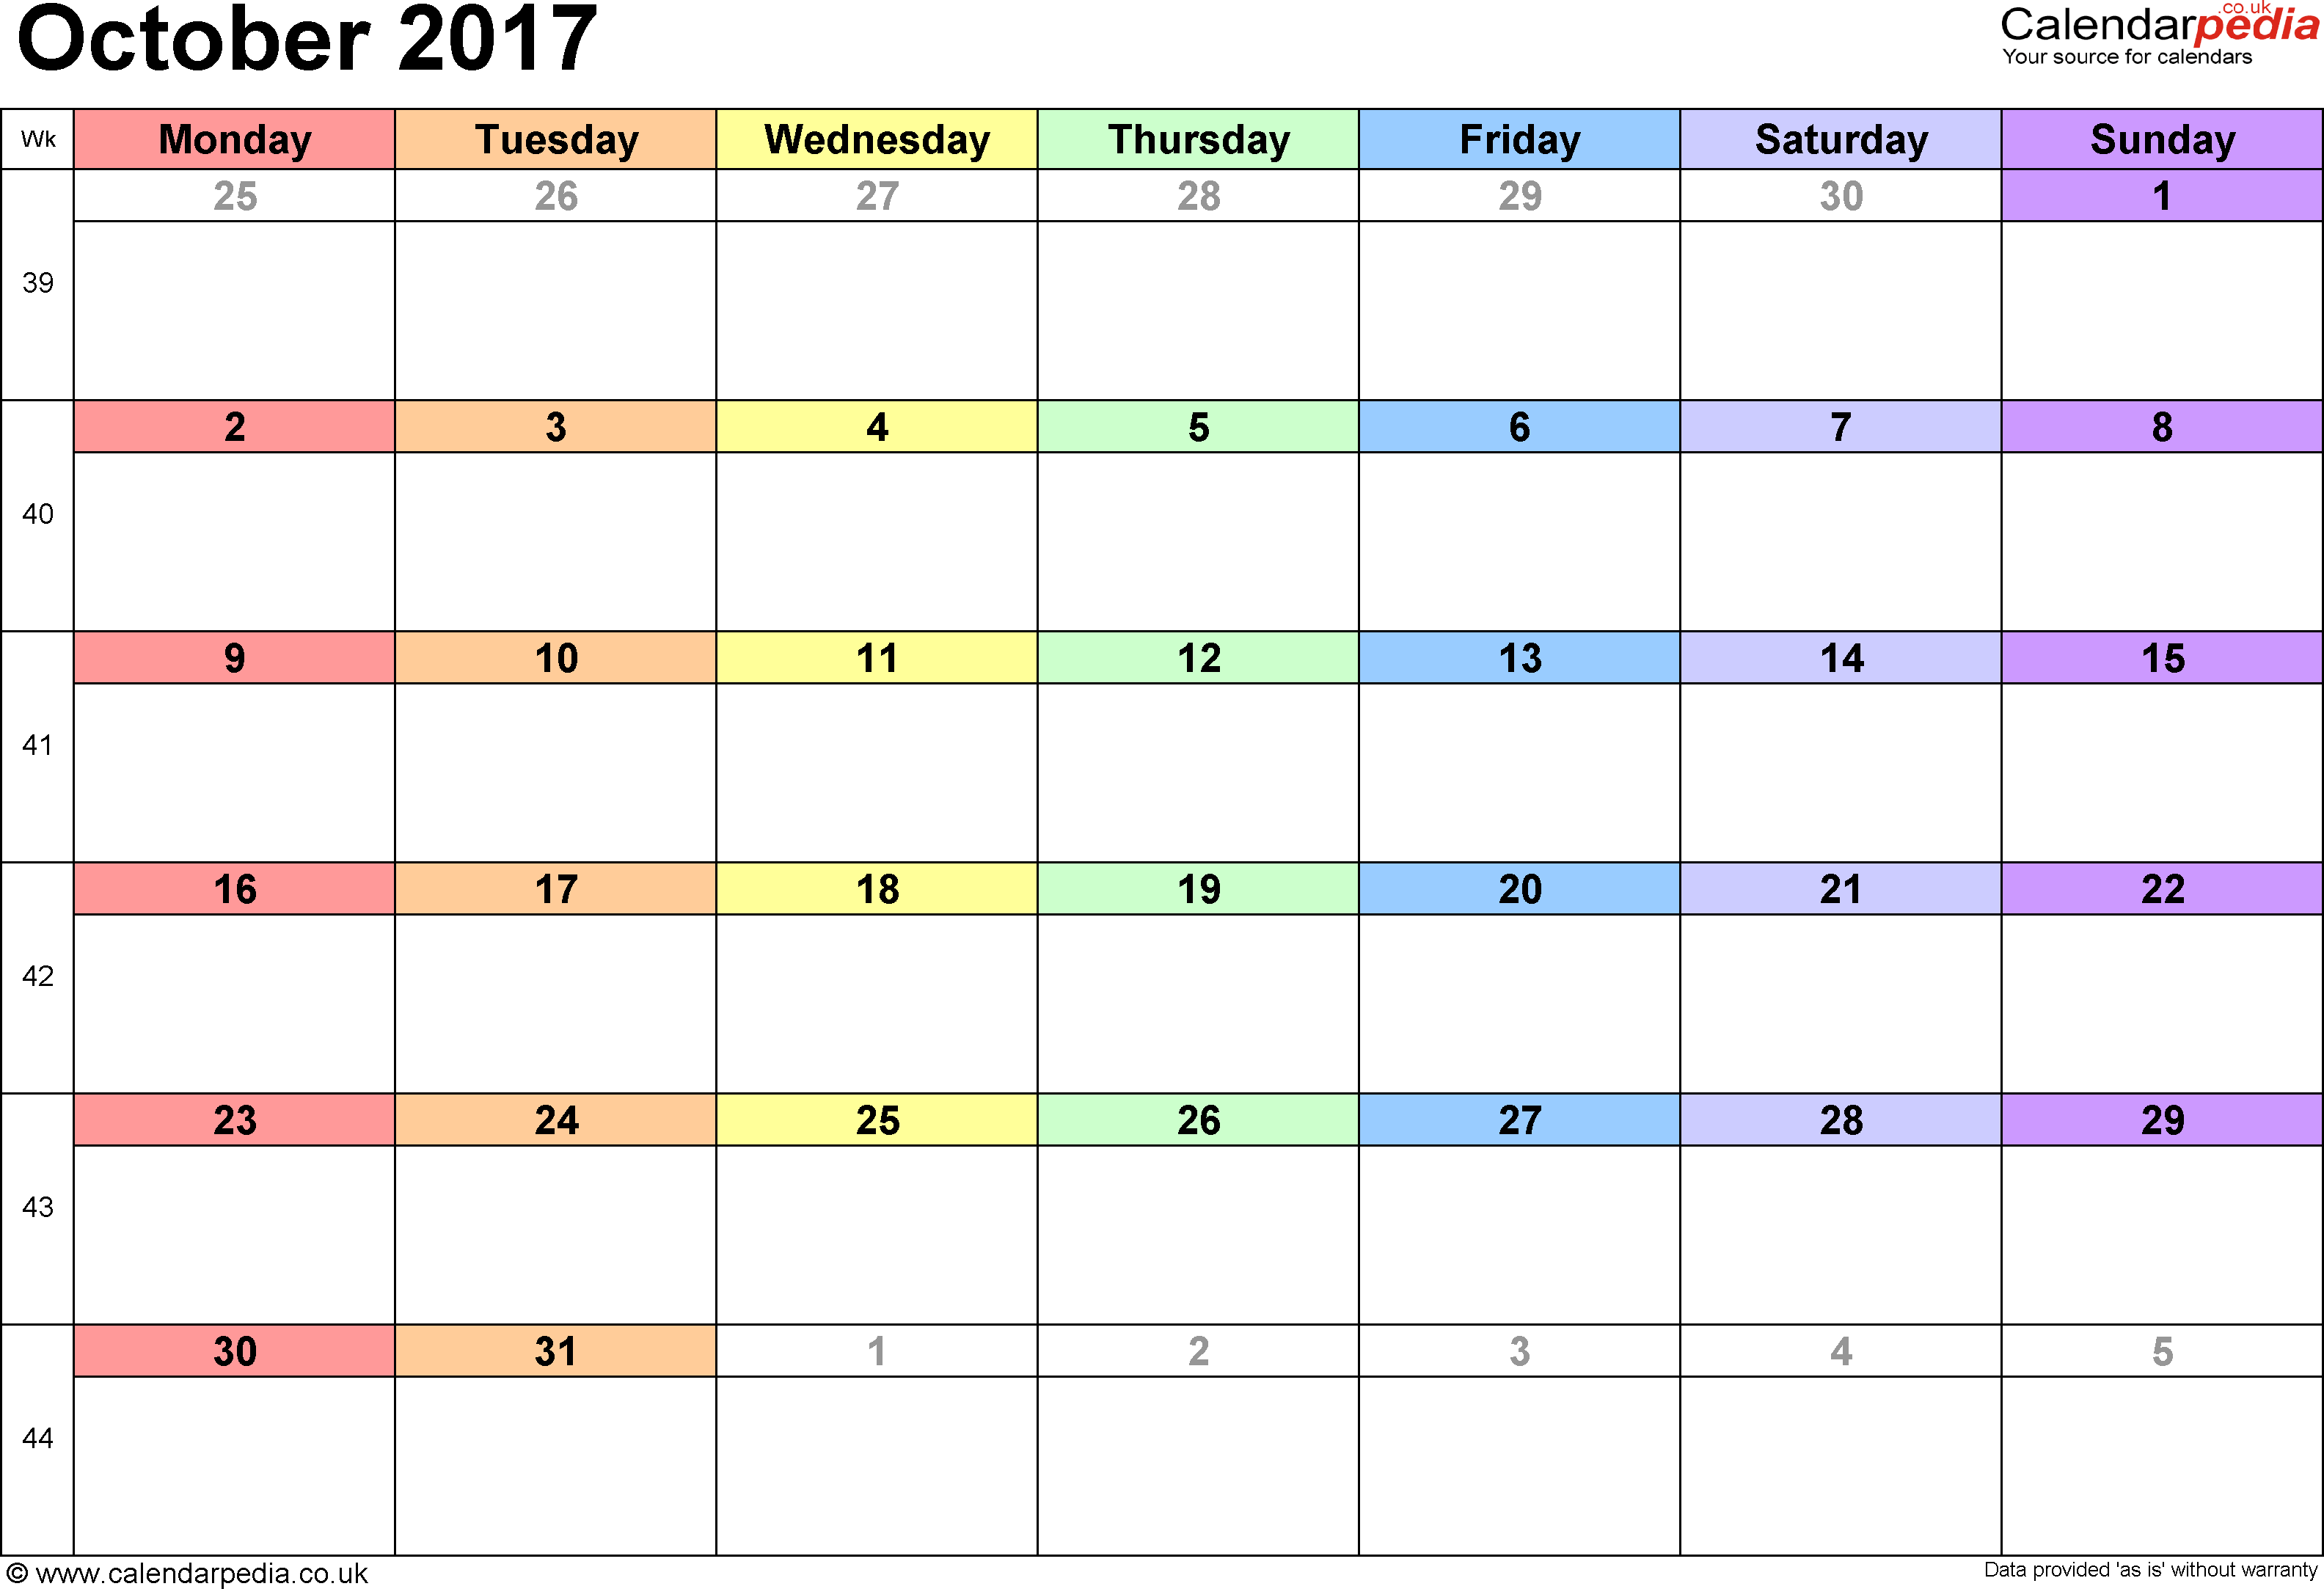 Calendar October 2017 UK, Bank Holidays, Excel/PDF/Word Templates